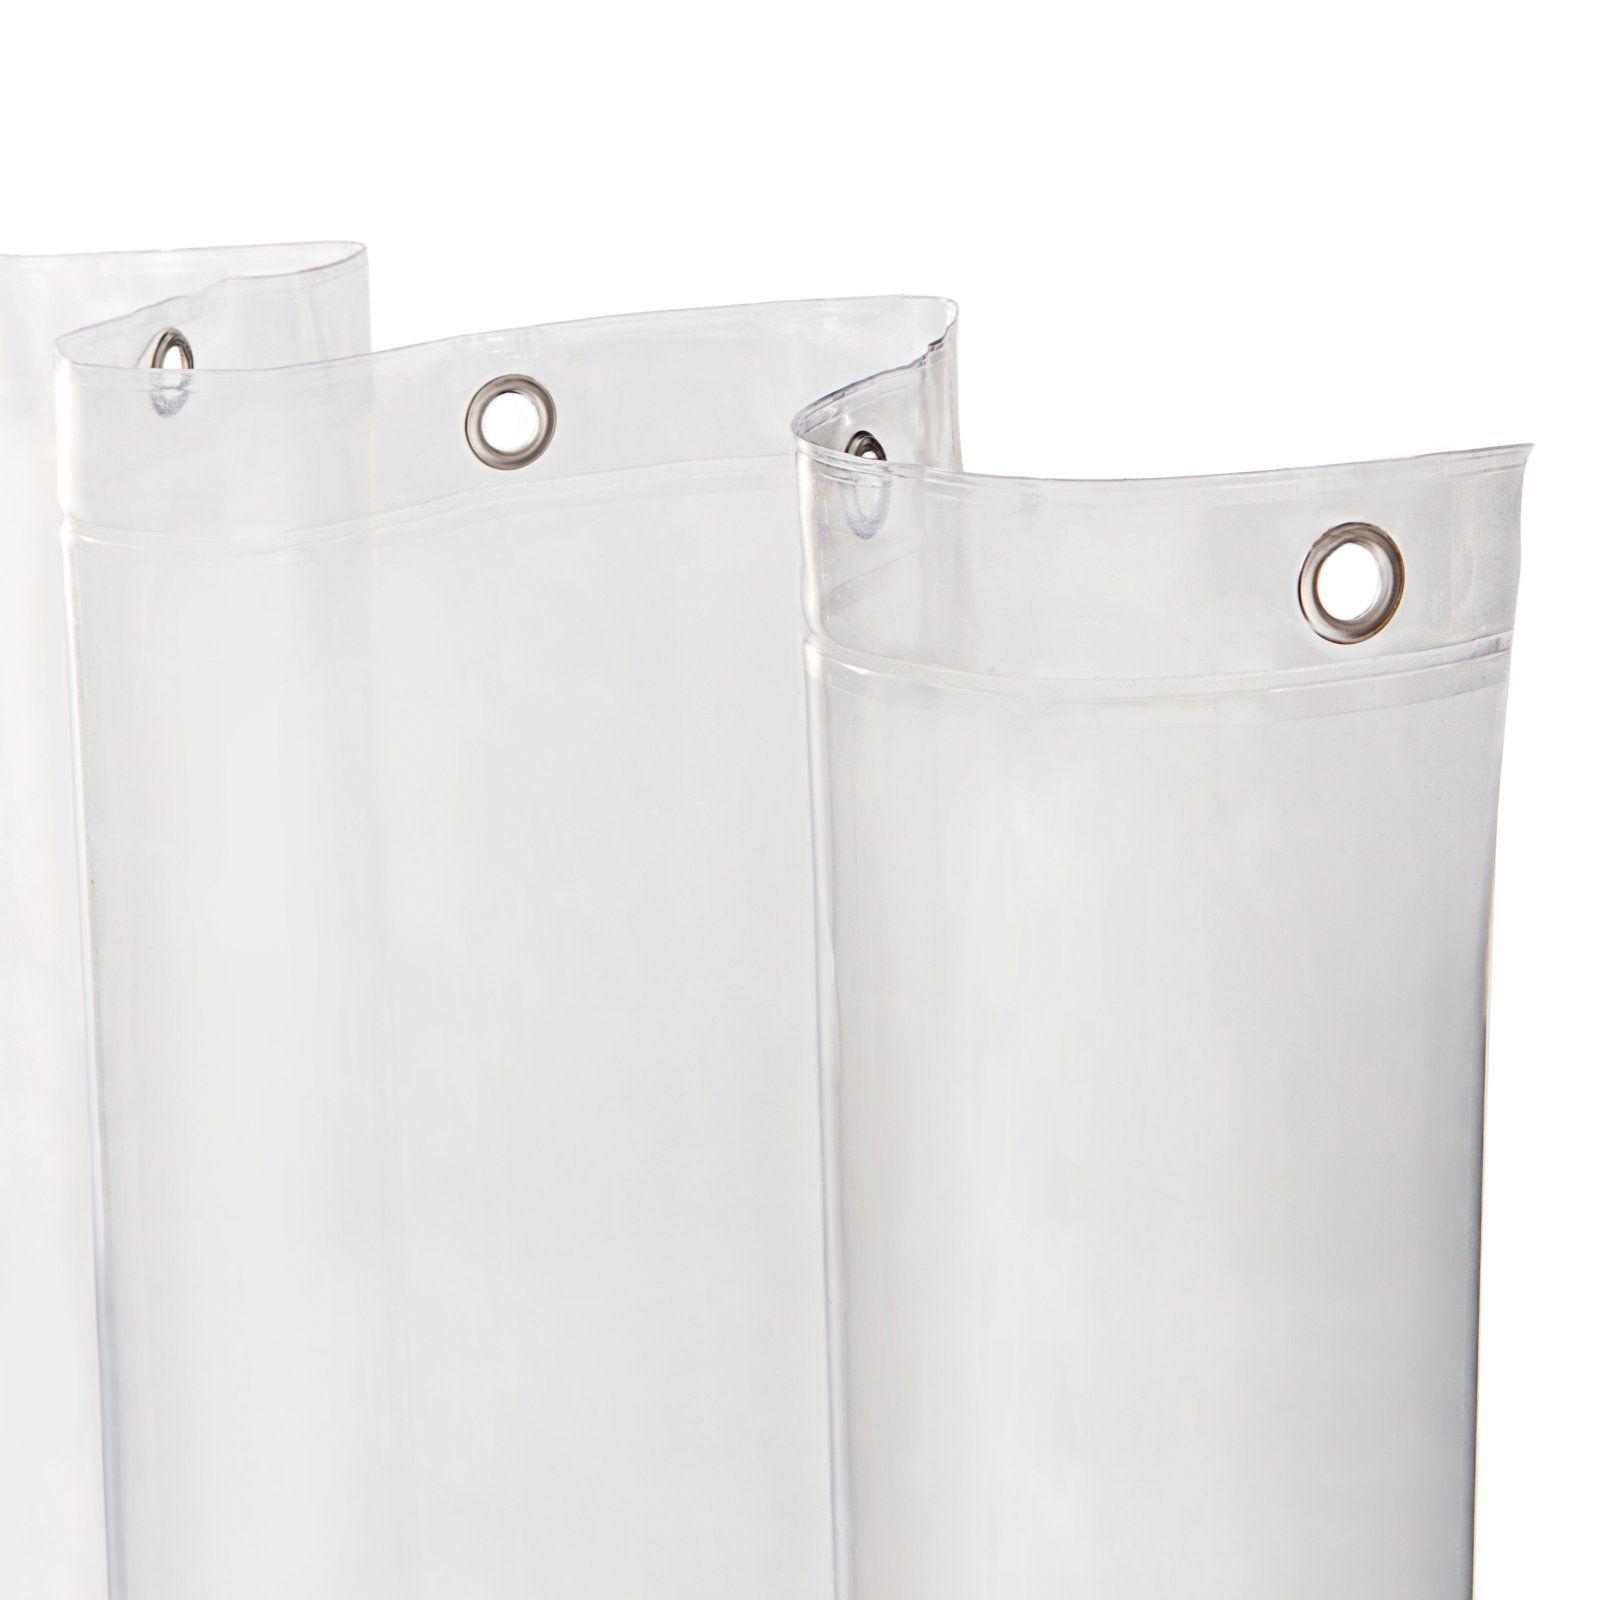 Kenney Heavyweight Mildew Resistant Peva Shower Curtain Liner Clear Shower Liner Shower Waterproof Liner